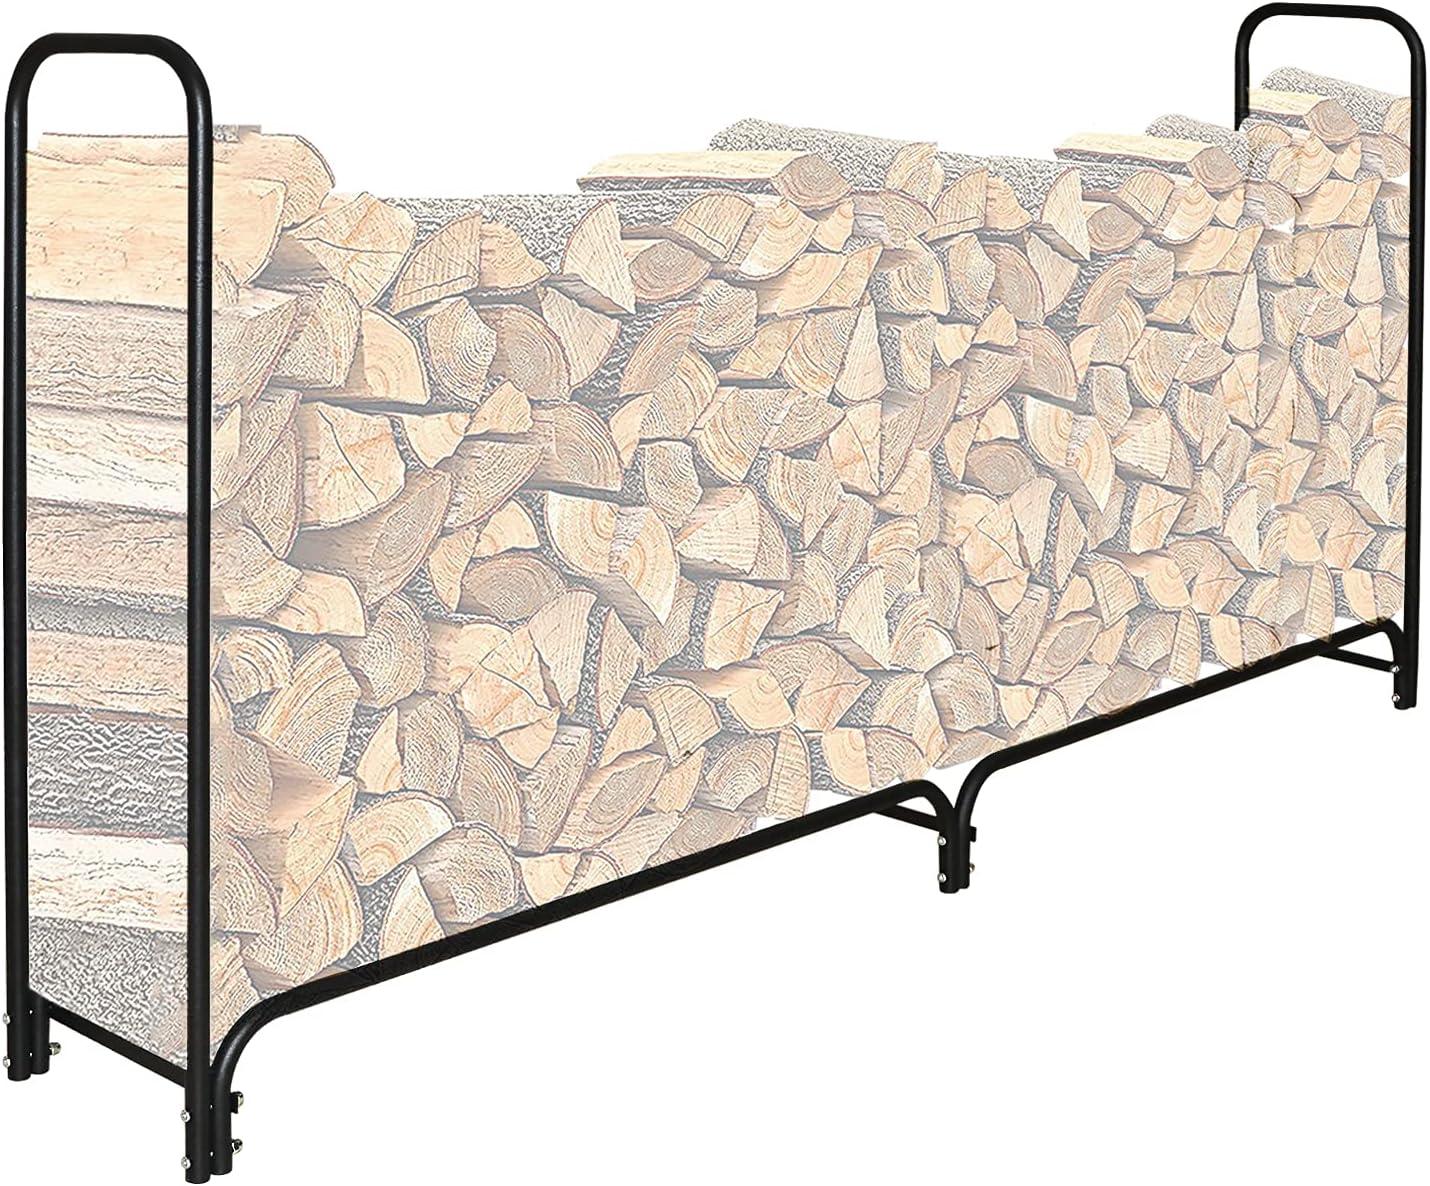 SnugNiture 8 Feet Japan's largest assortment Outdoor Firewood Wood Steel Tubular Daily bargain sale Rack